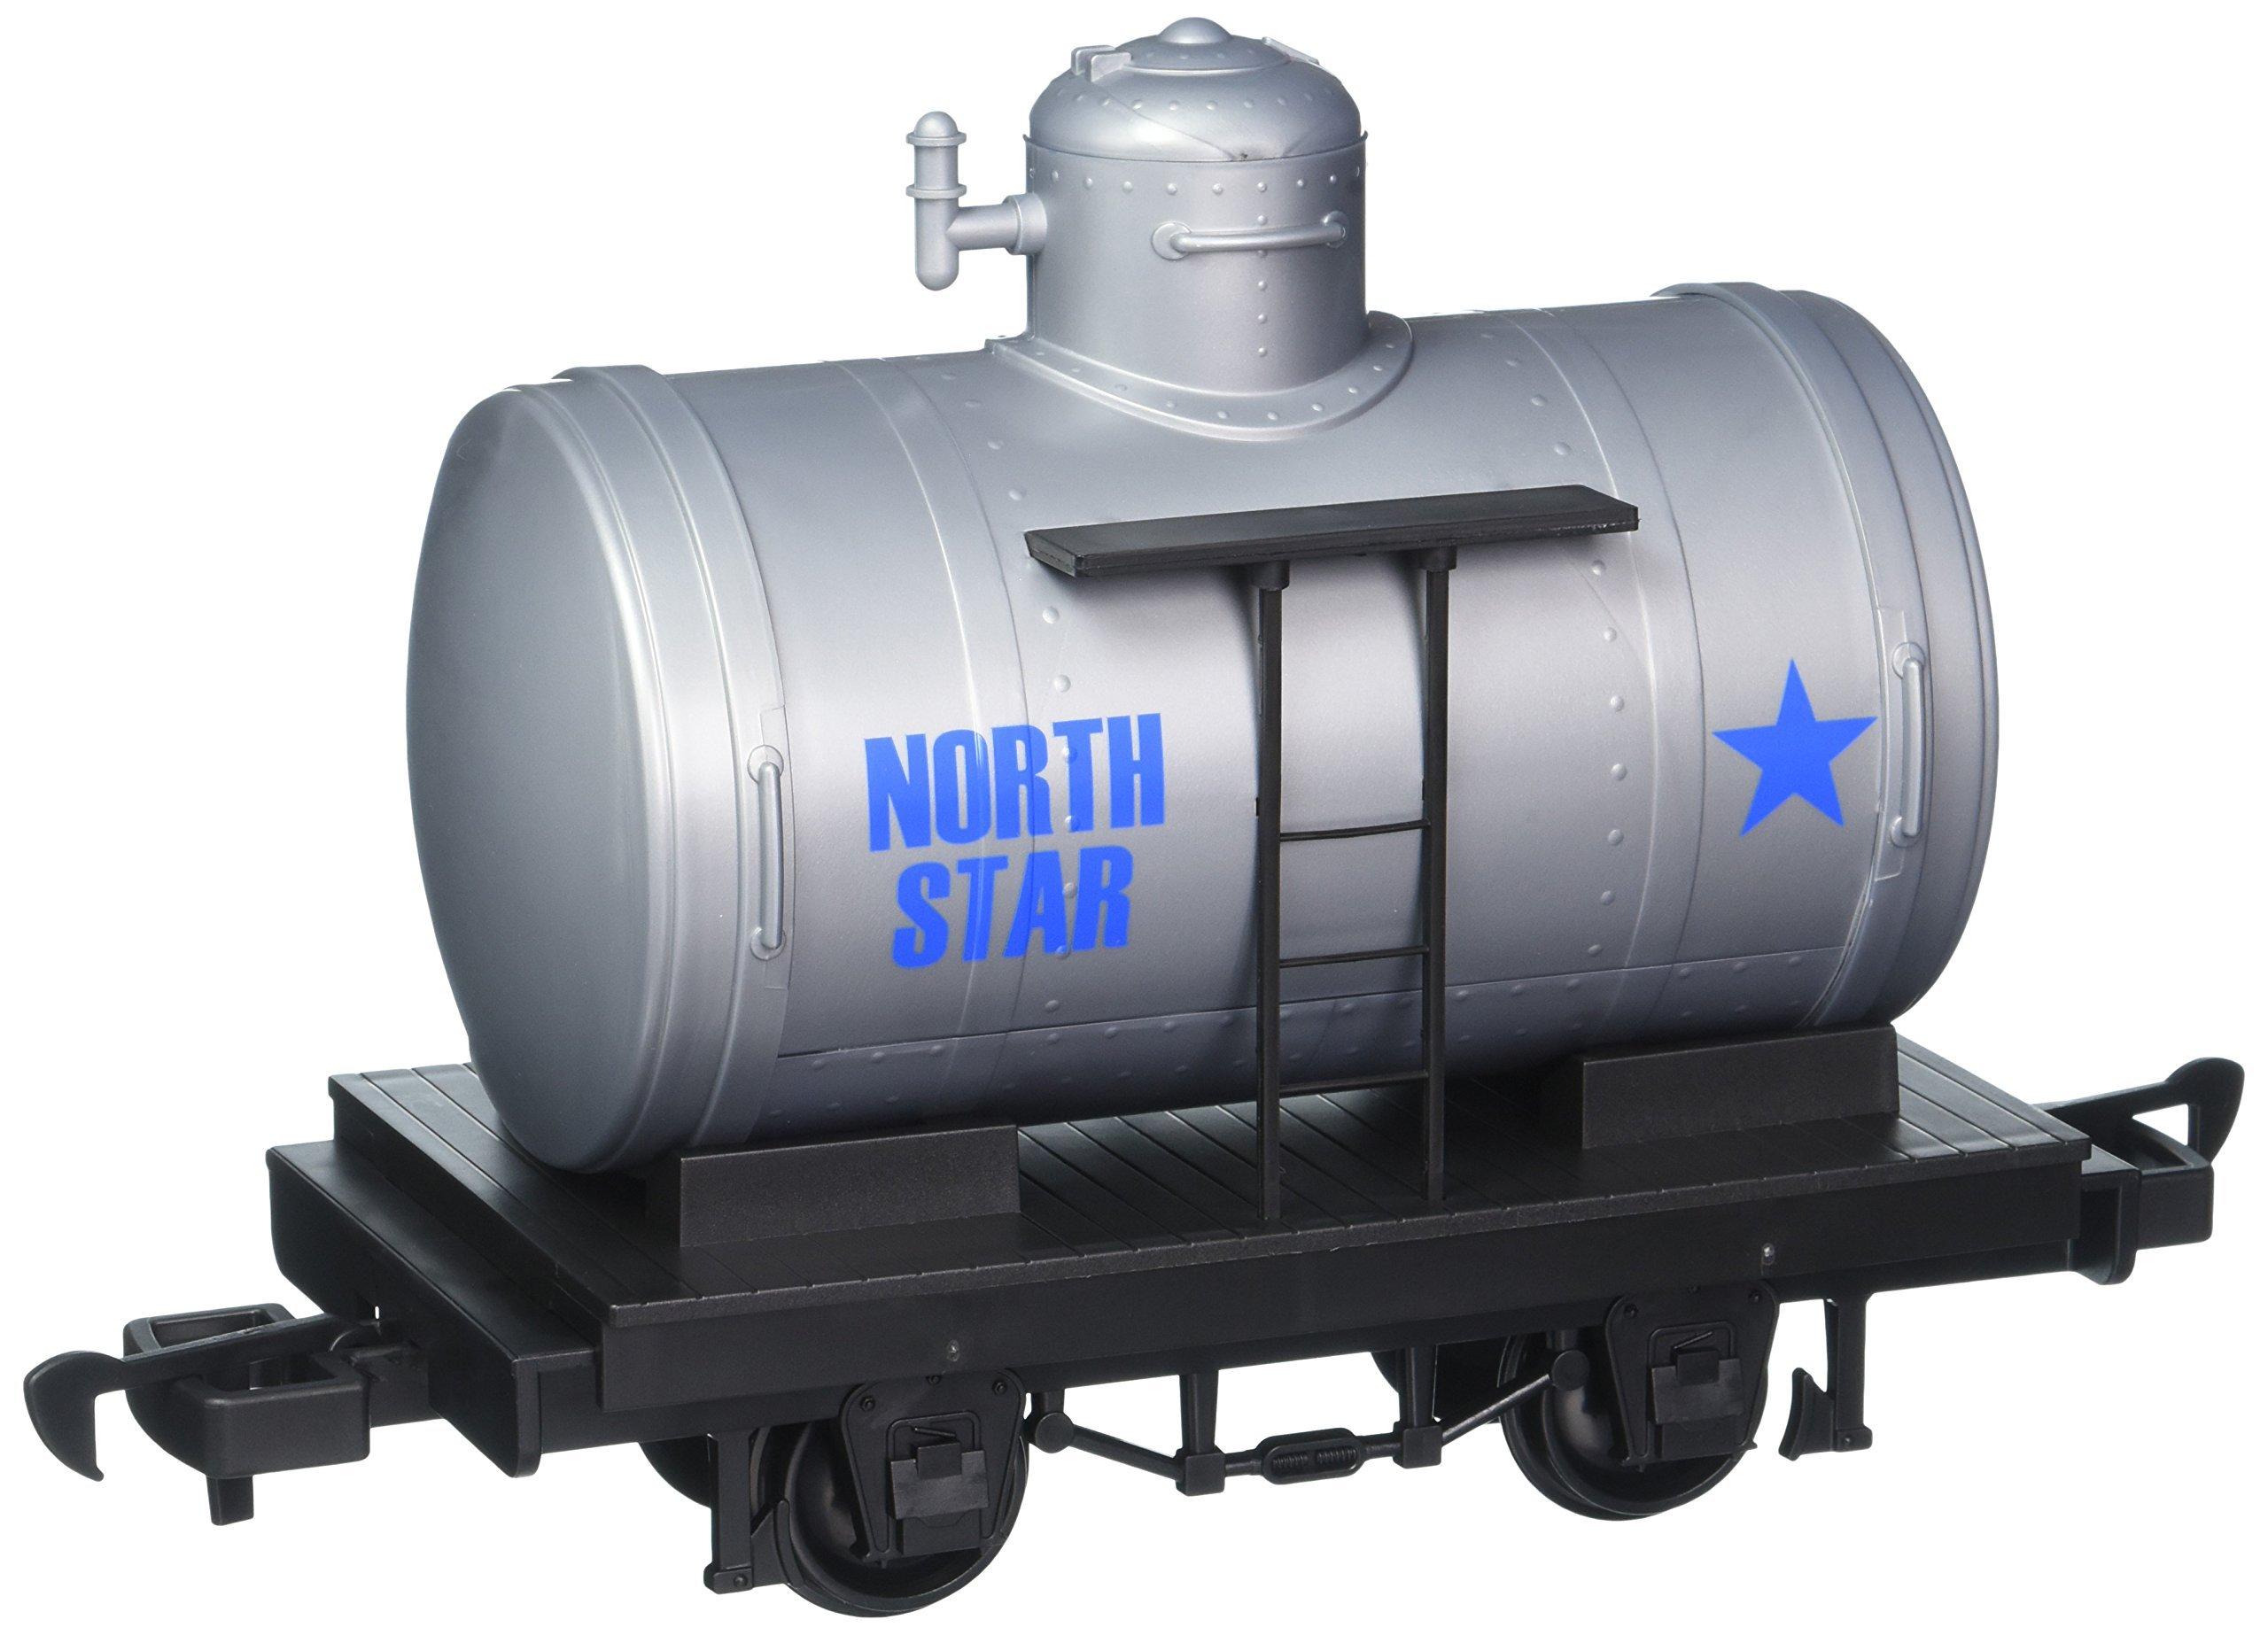 Bachmann Industries Li'l Big Haulers North Star G-Scale Tank Car, Large